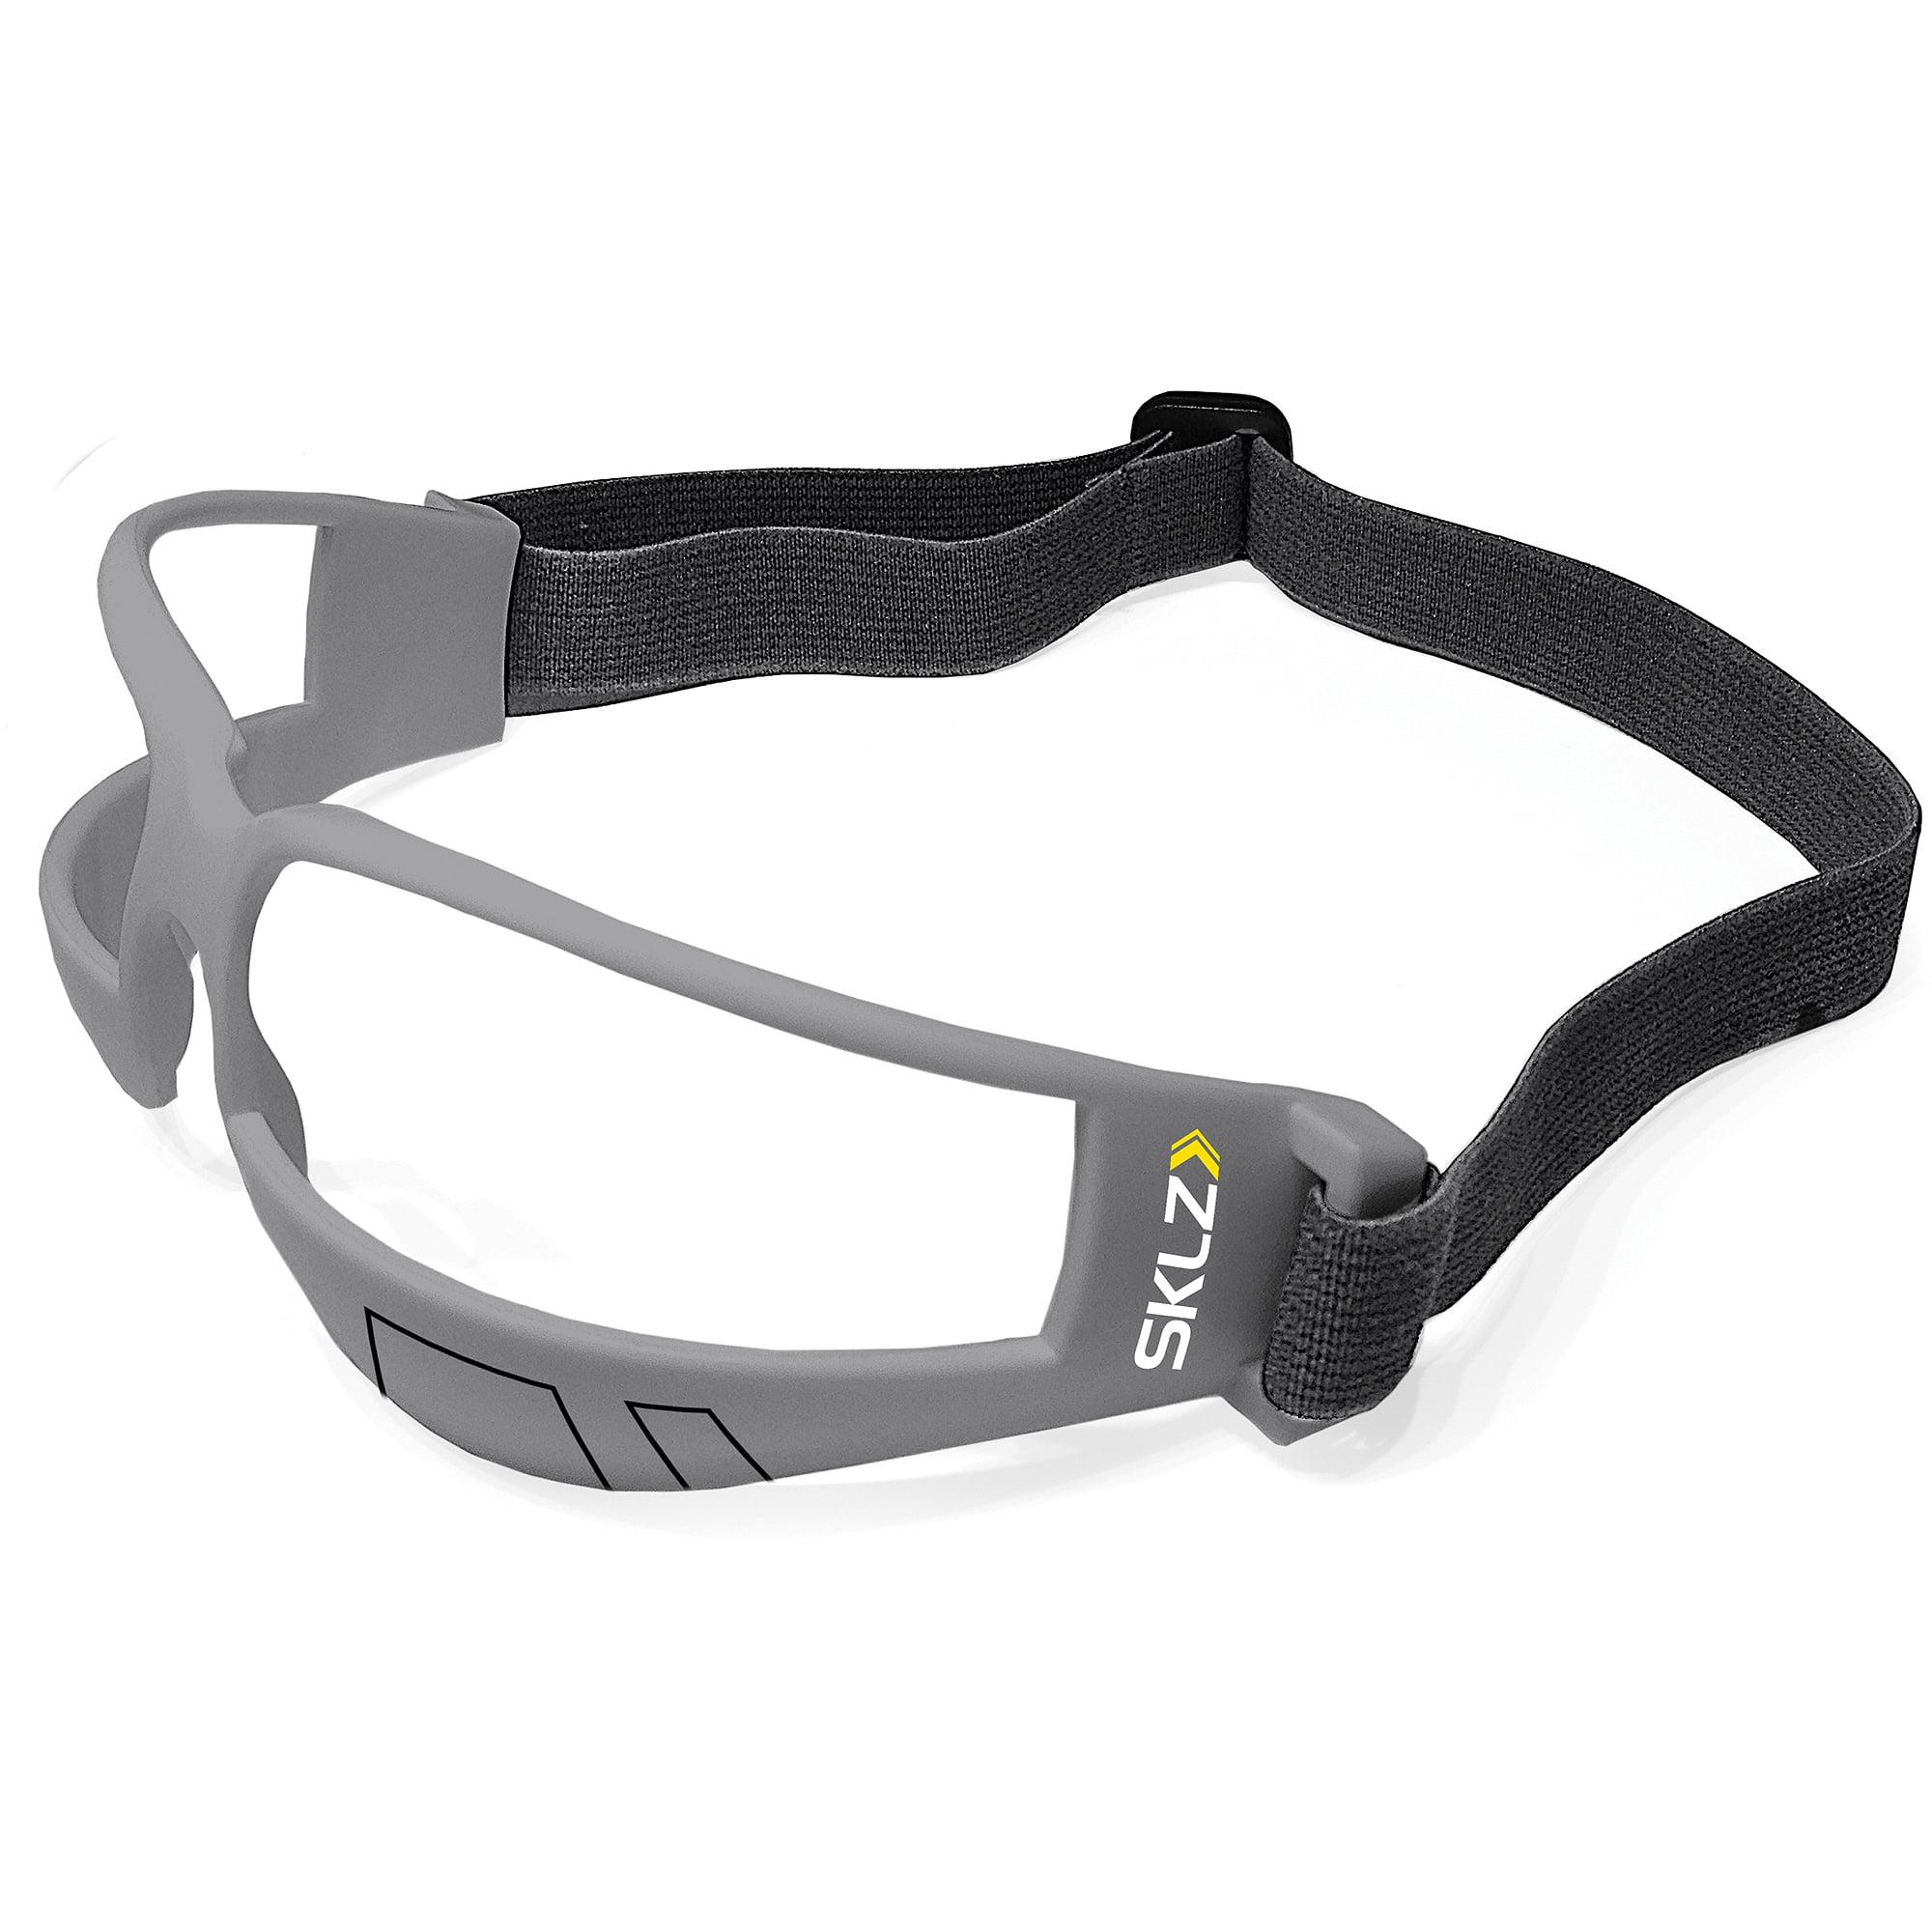 SKLZ Court Vision Dribble Goggles